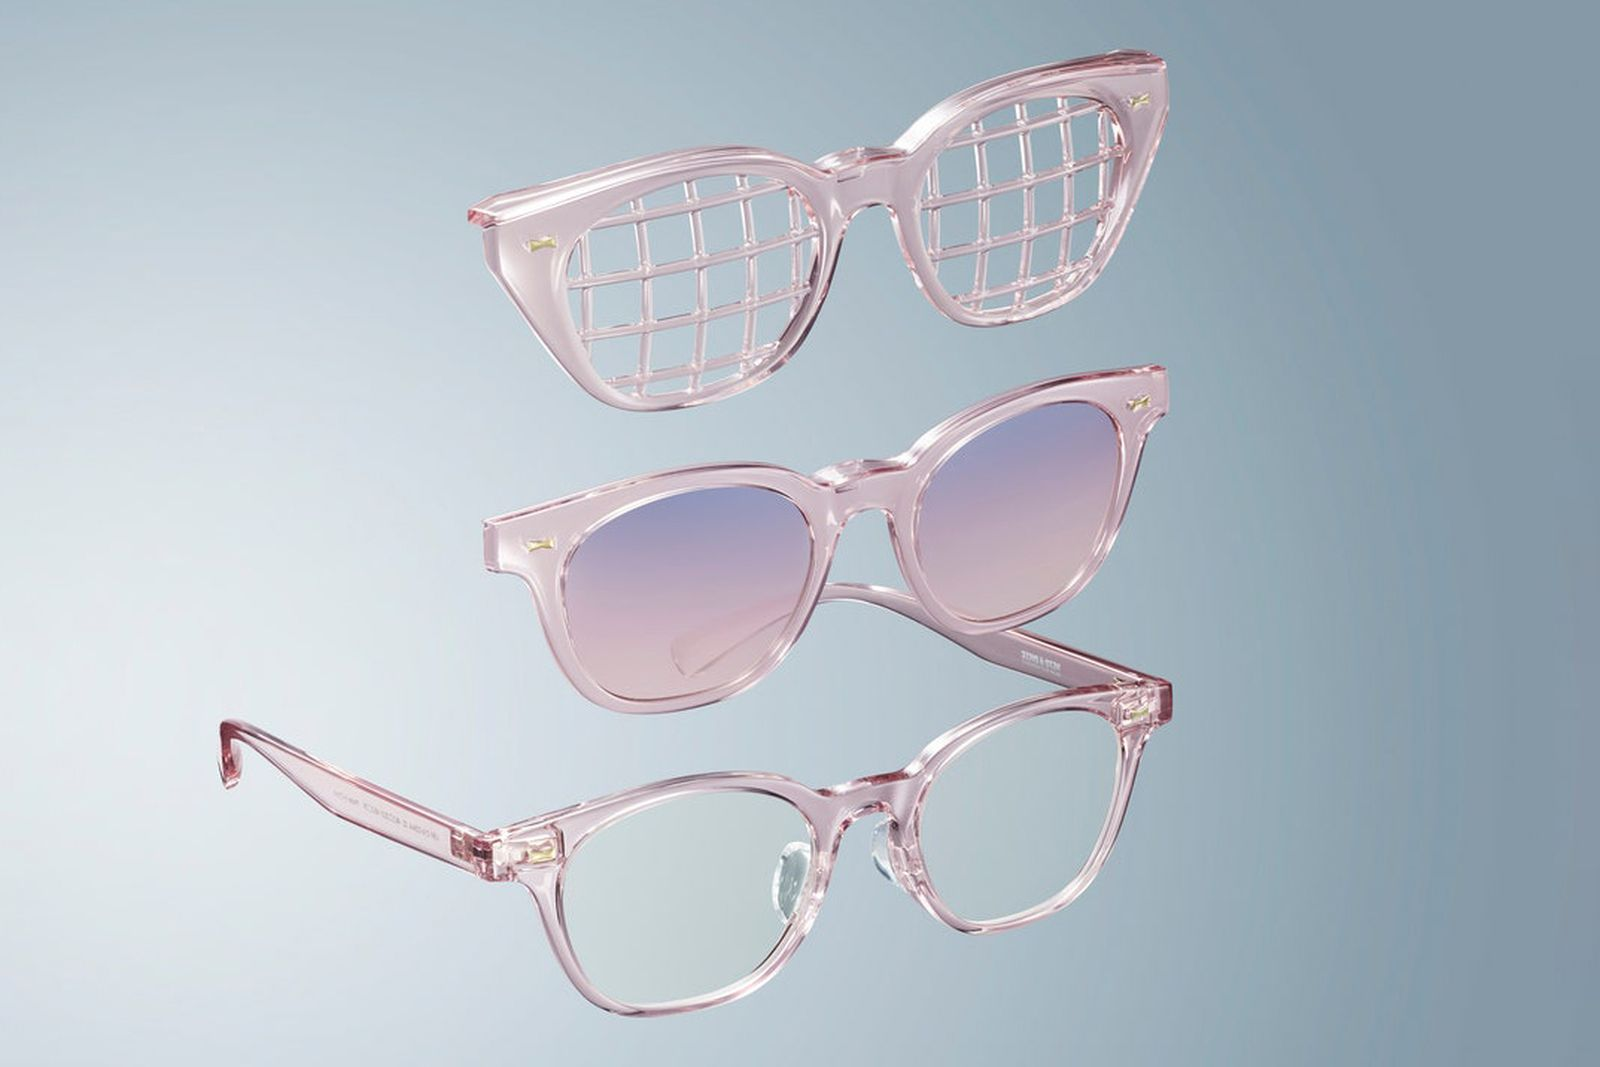 verdy-jins-sun-nigo-glasses-collab- (3)